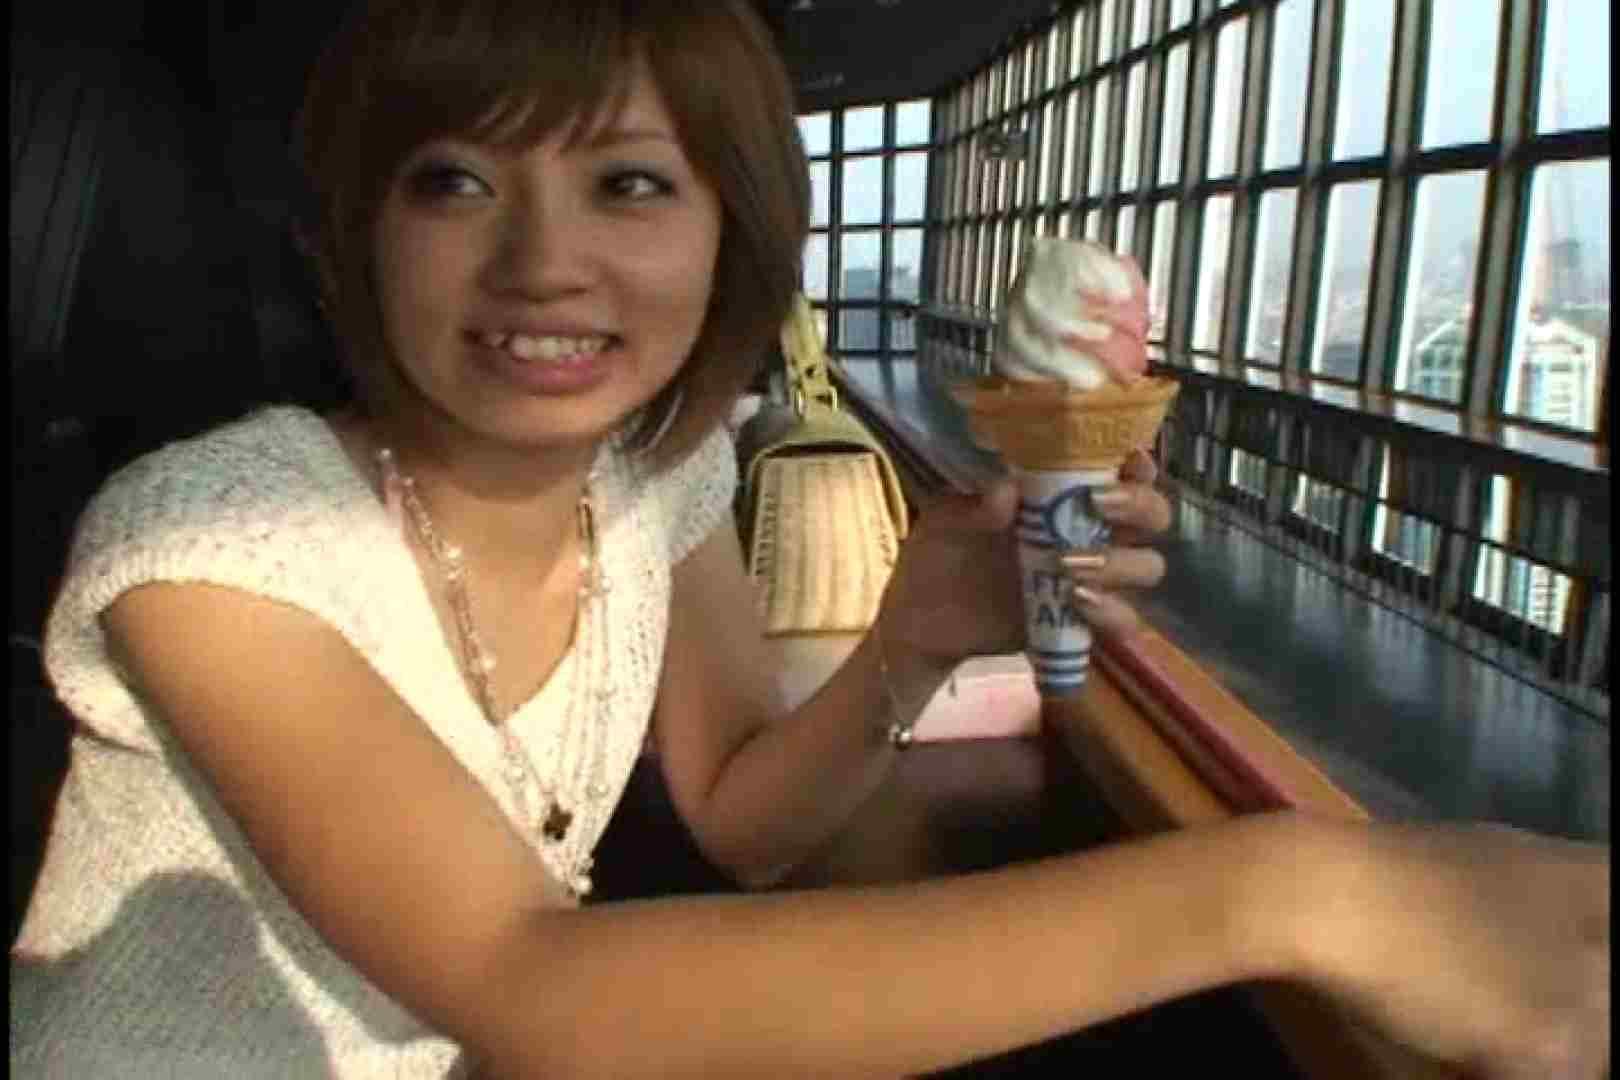 JDハンター全国ツアー vol.026 前編 女子大生のエロ動画  82PIX 46